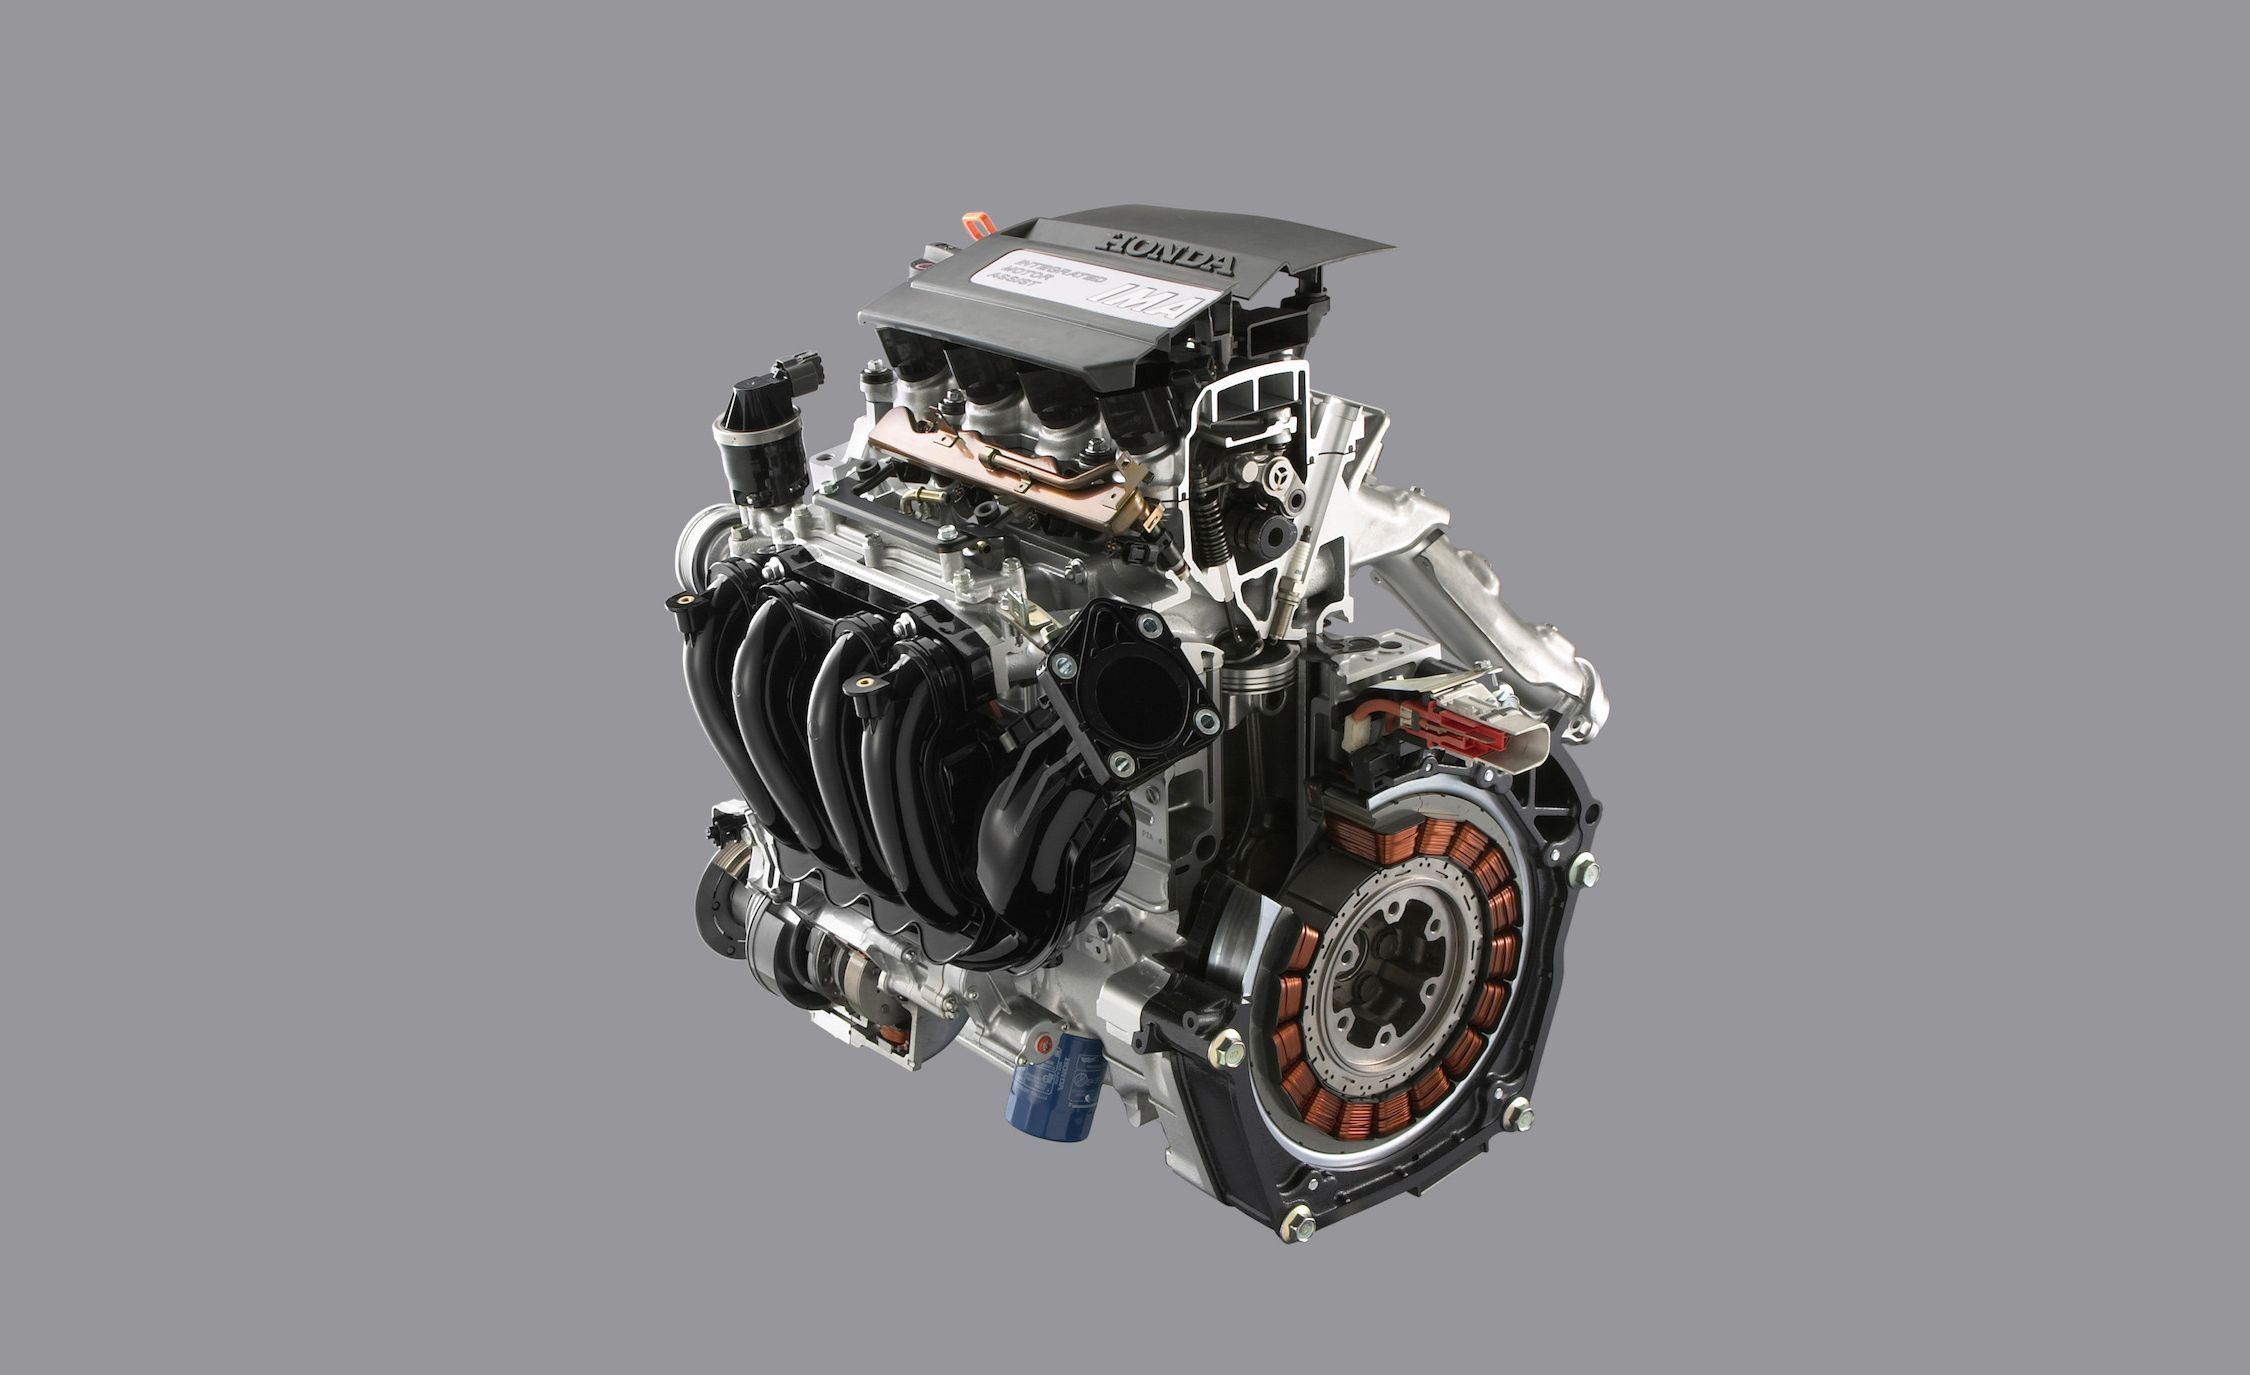 Civic Pride A Visual History Of The Honda Flipbook Car Rhcaranddriver: 2004 Honda Civic Hybrid Engine Diagram At Elf-jo.com